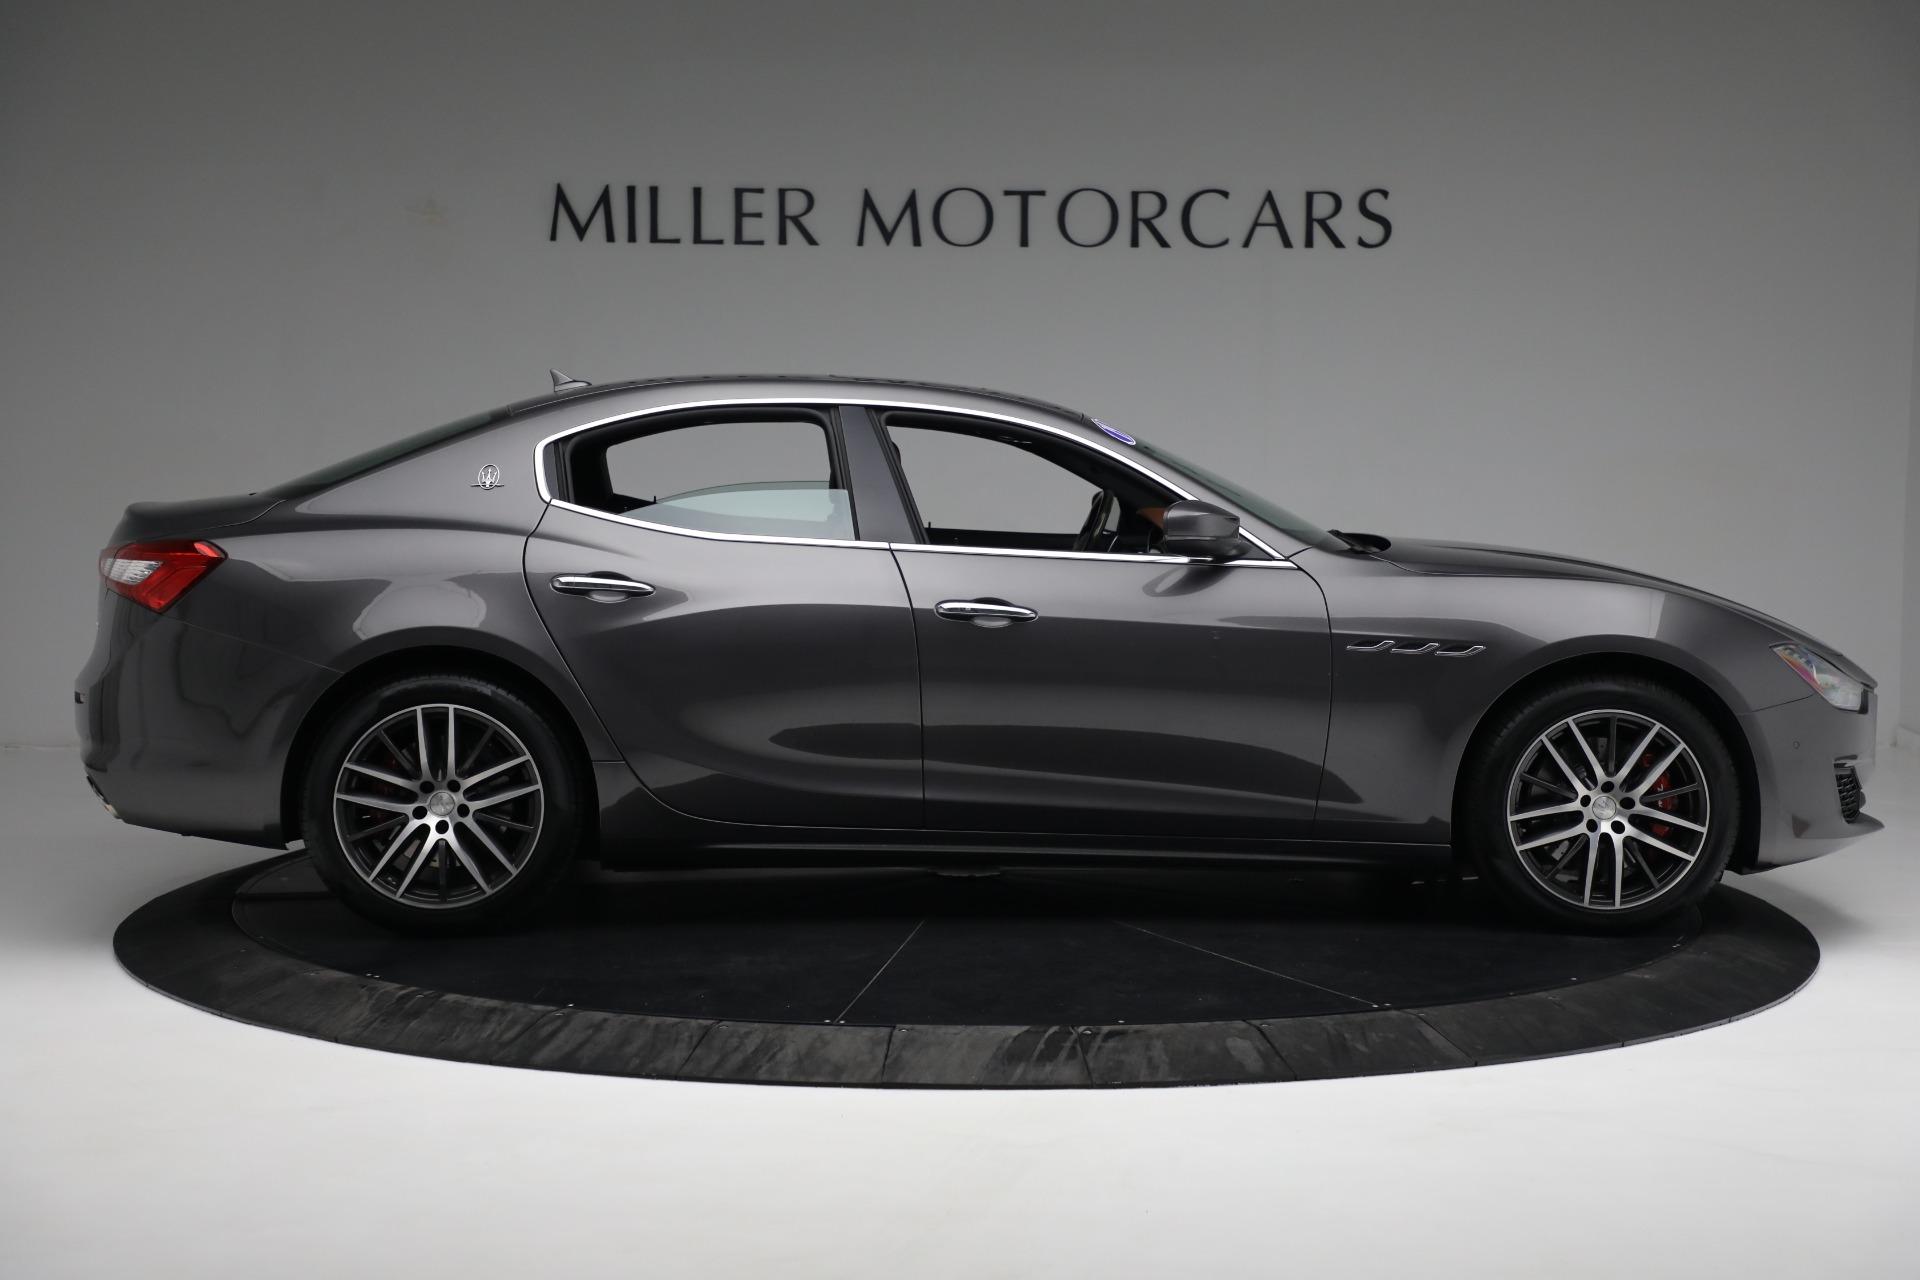 New 2019 Maserati Ghibli S Q4 For Sale In Westport, CT 3019_p9